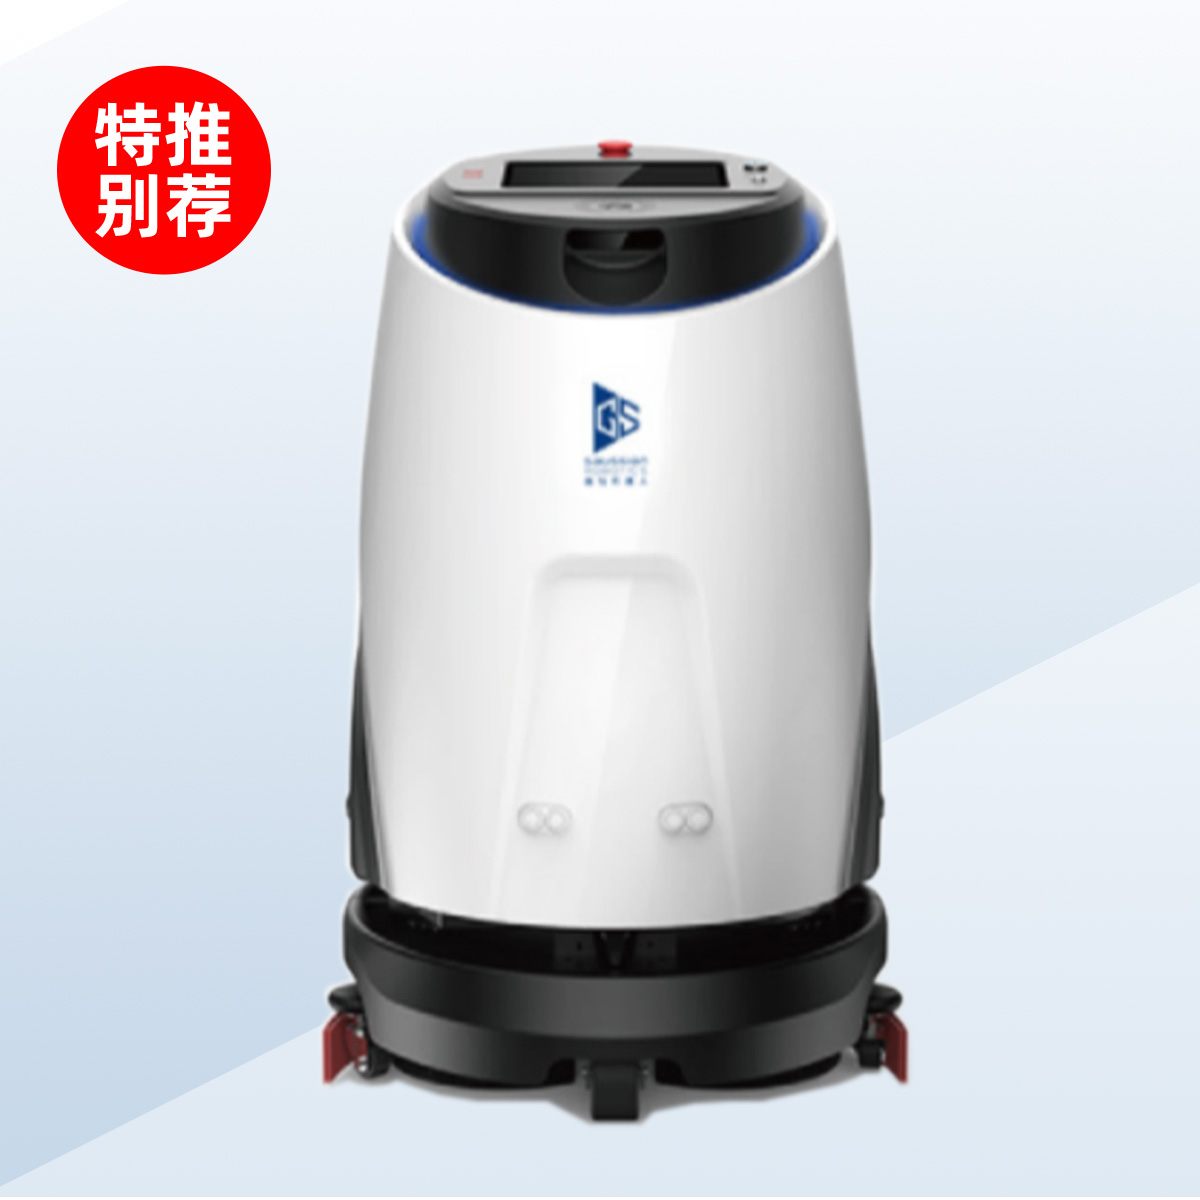 Ecobot Scrubber 50商用洗地机器人